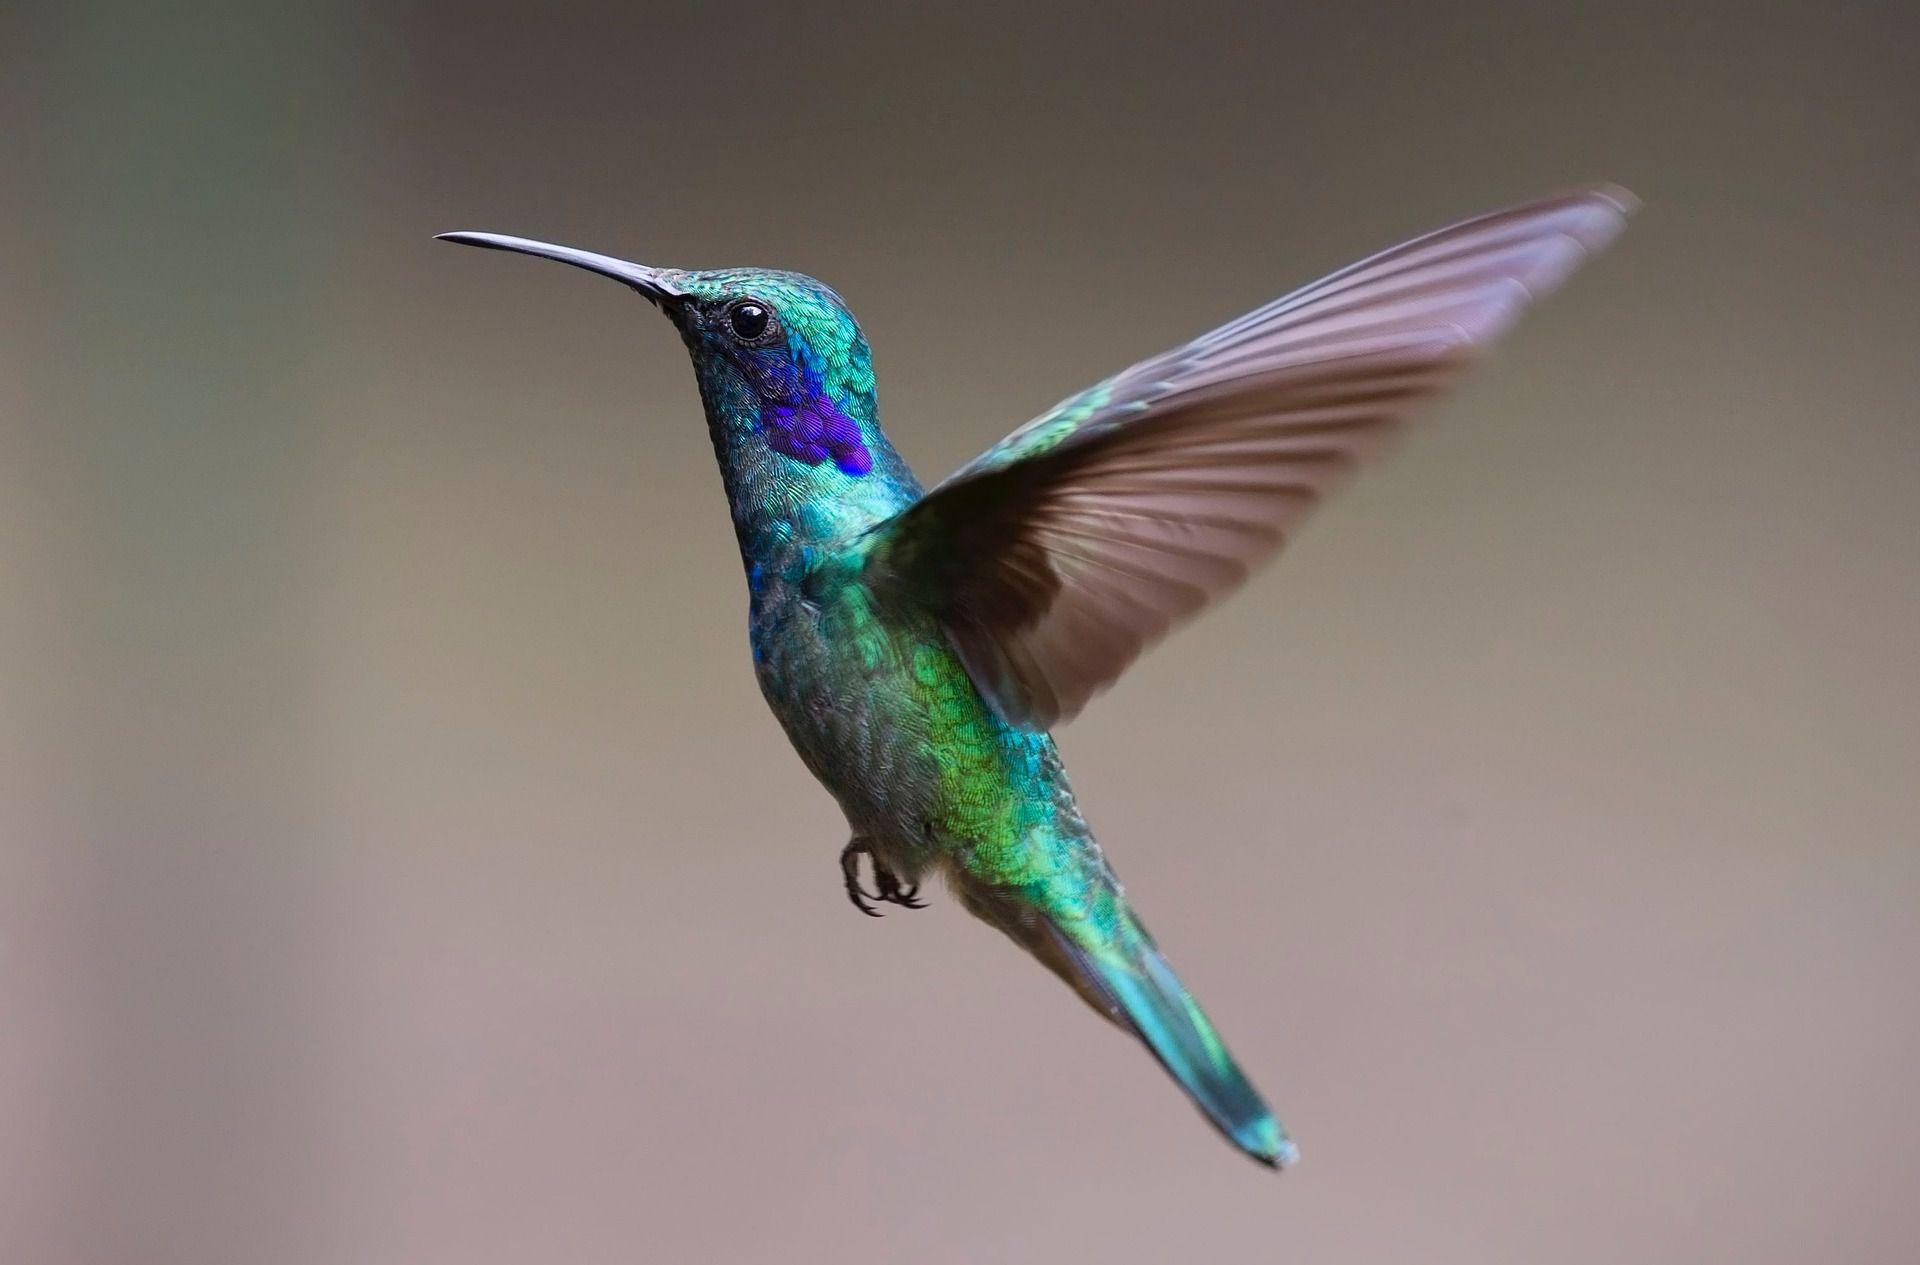 Hummingbird hovering in air